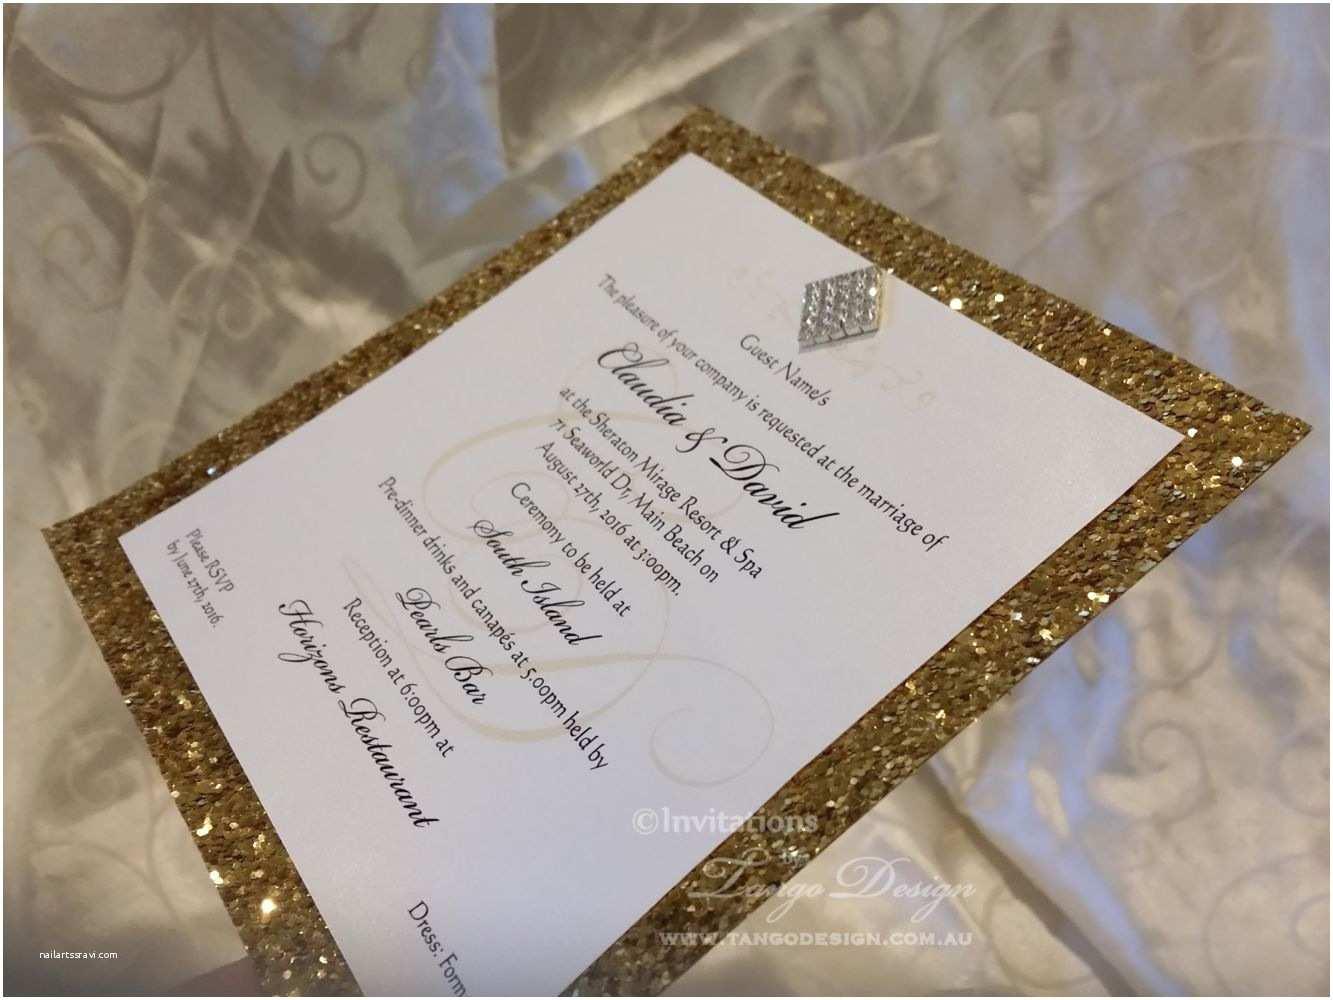 glitter wedding invitation in gold foil metallic paper or cus